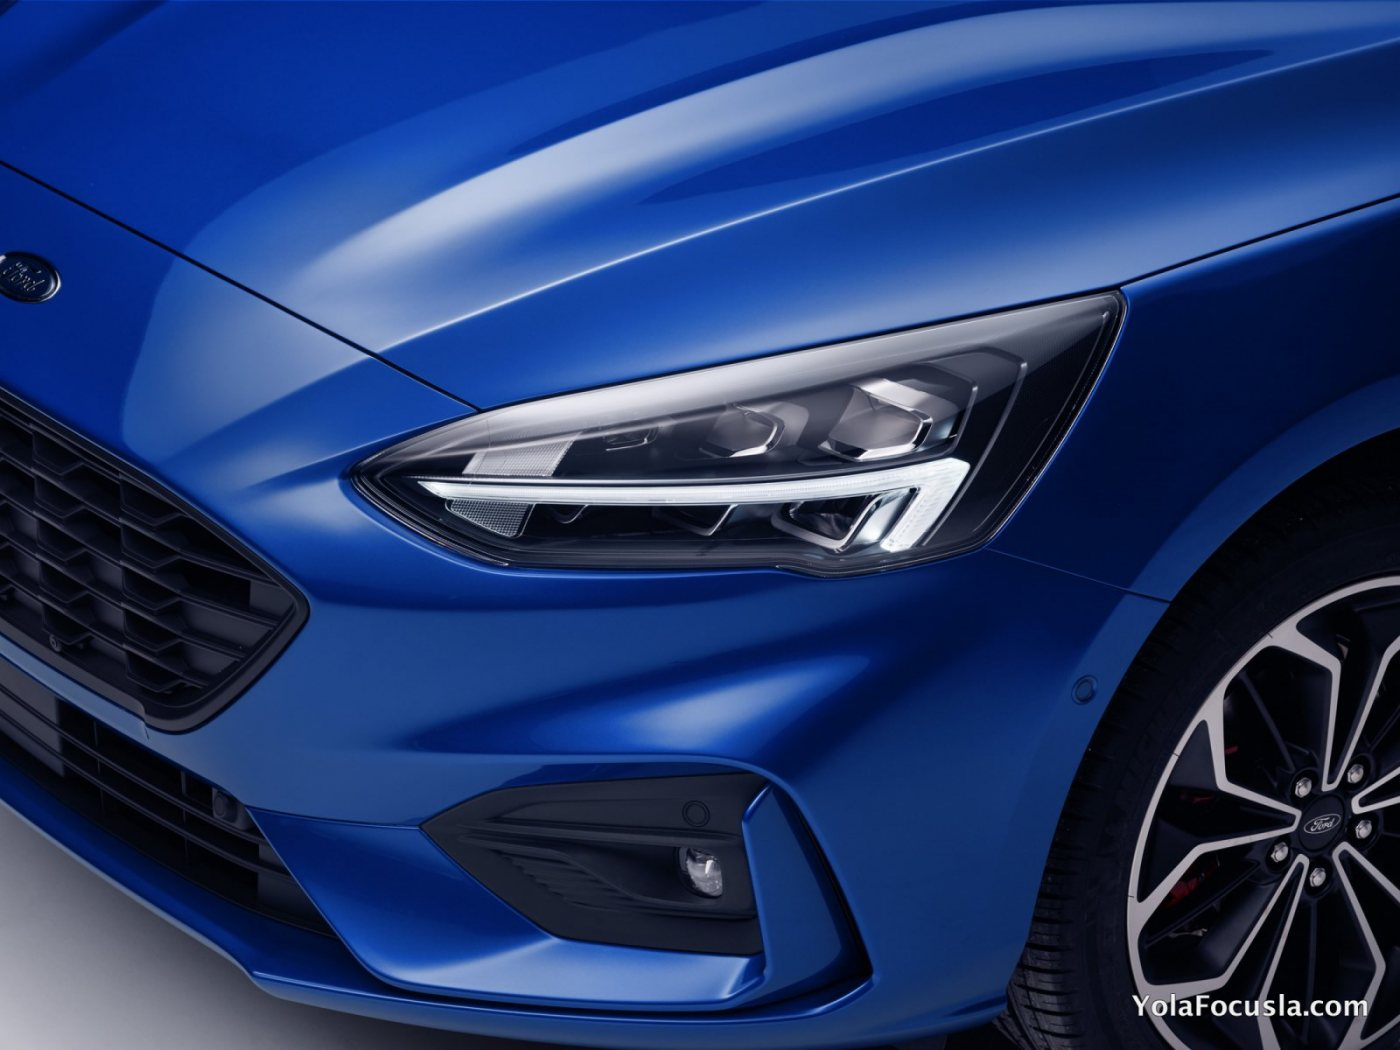 2018 Yeni Ford Focus Mk4_26.jpg